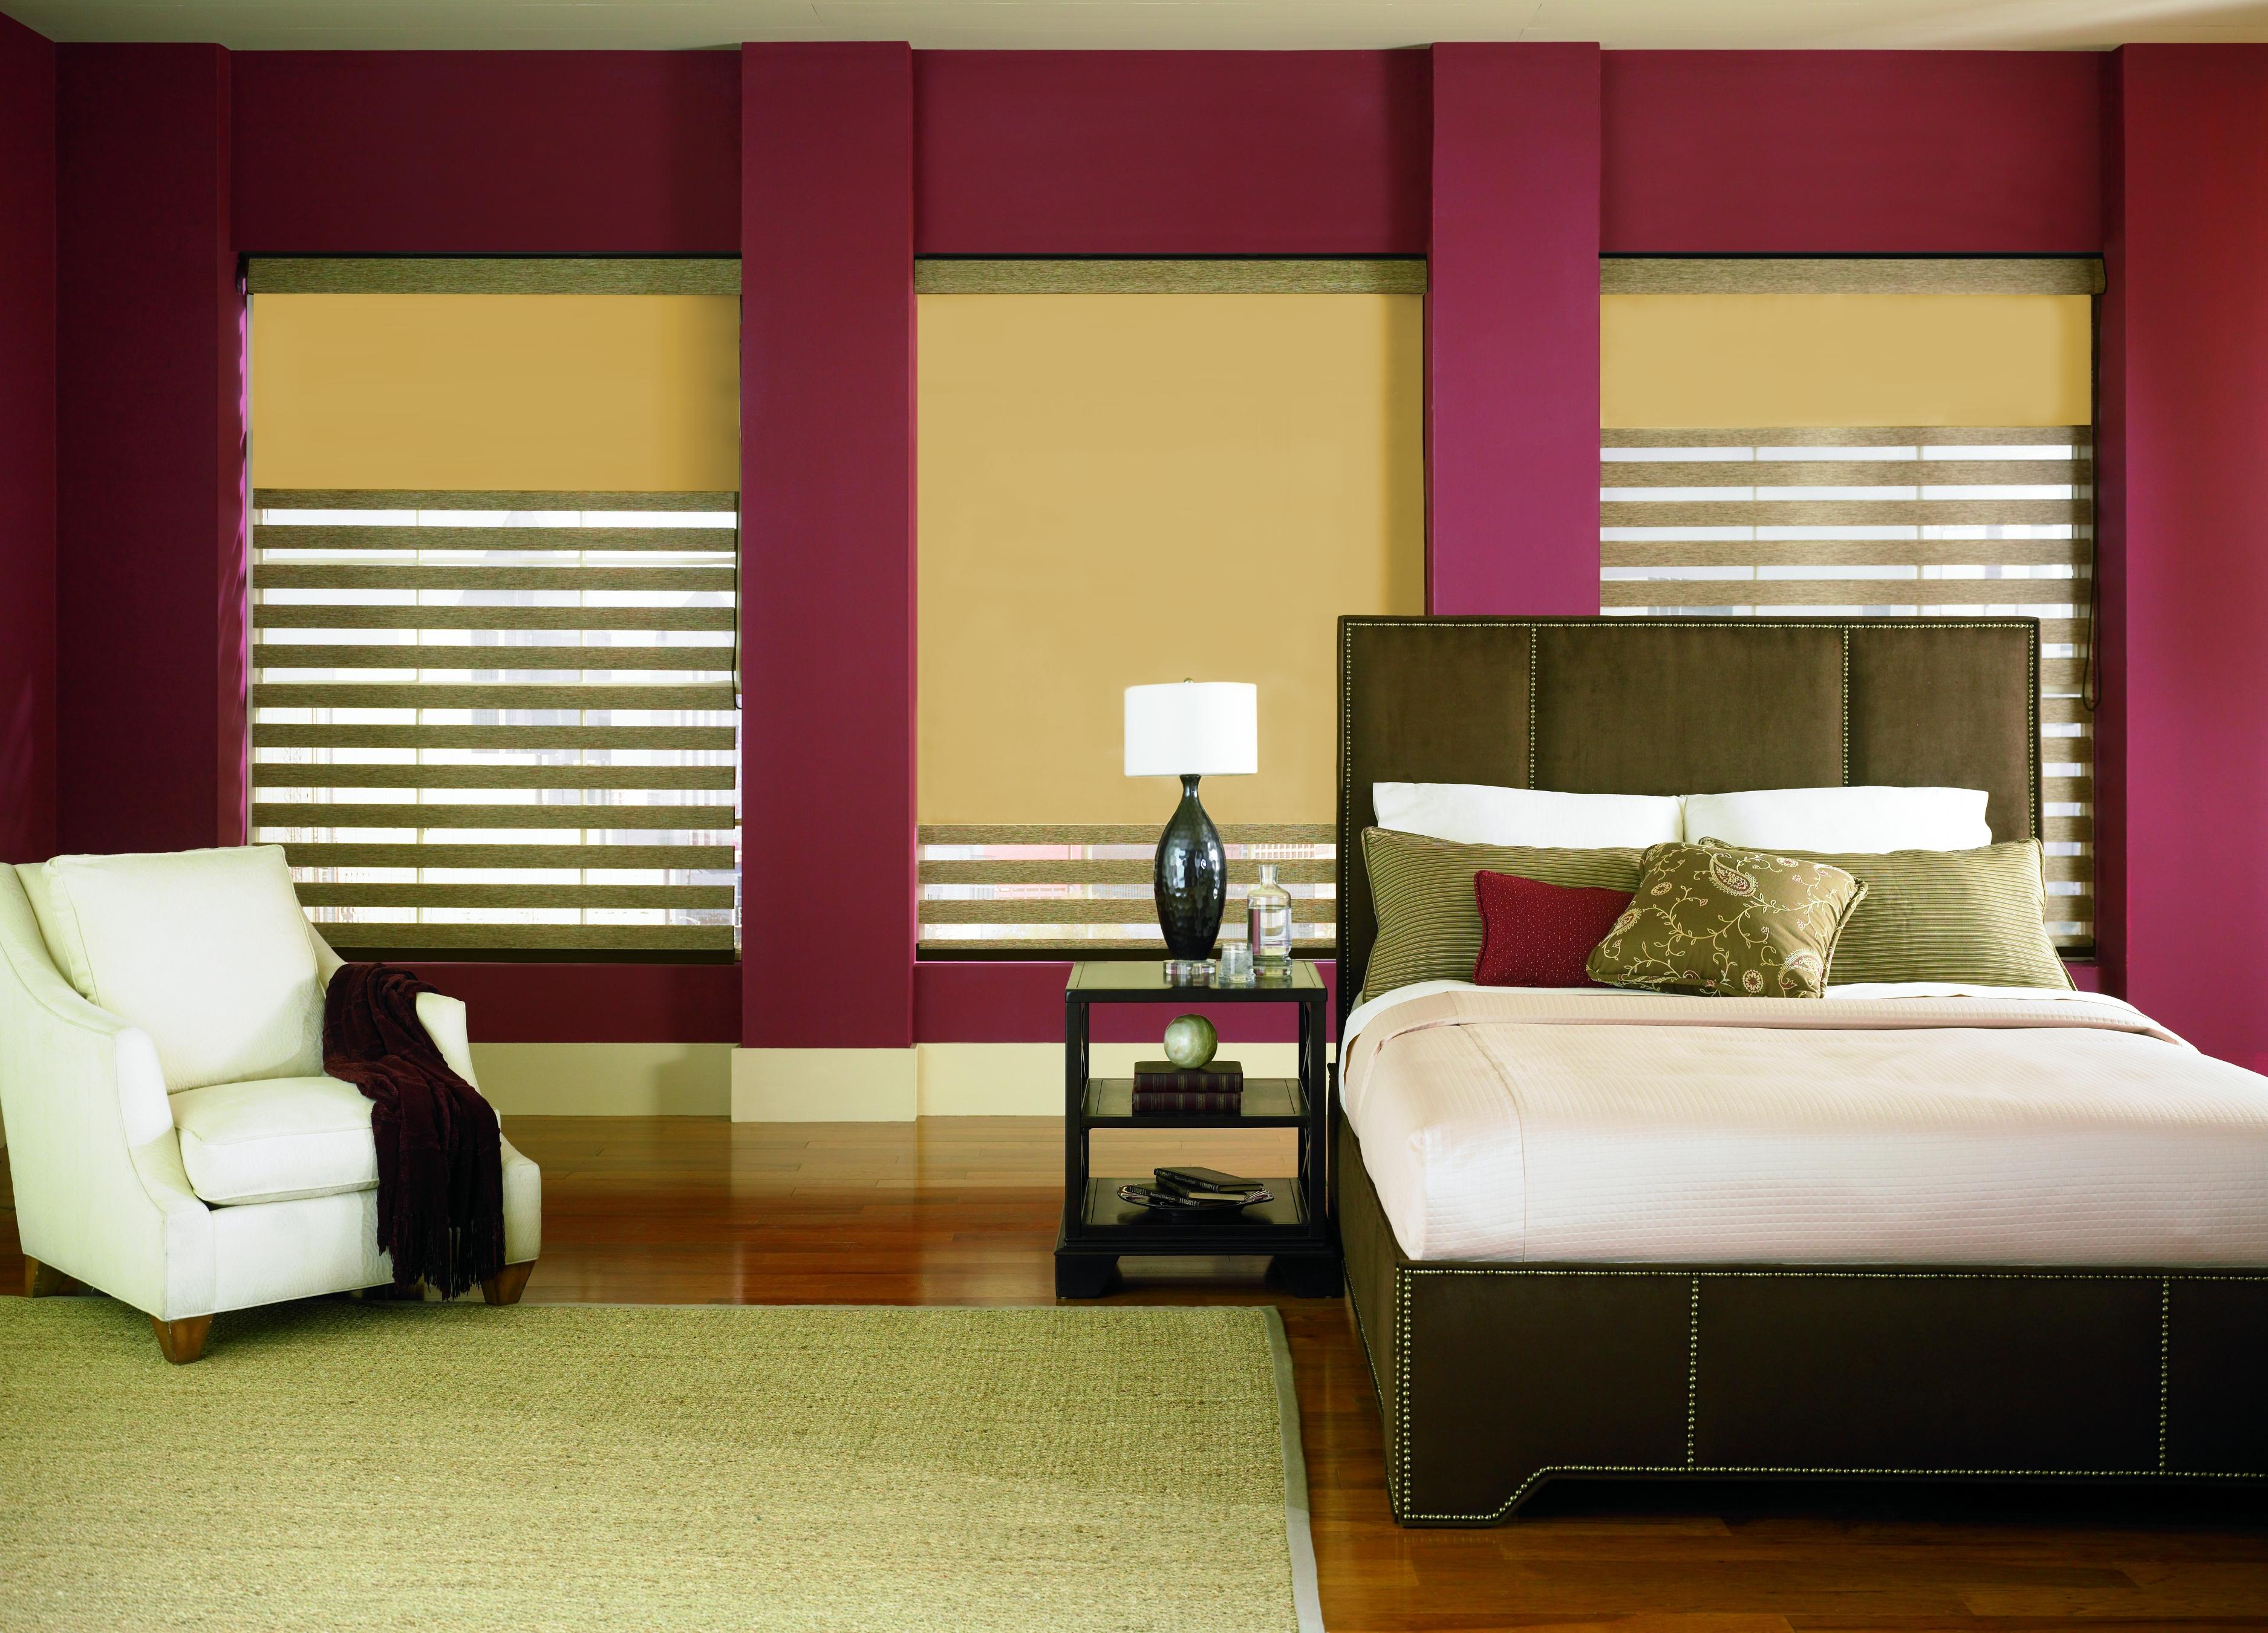 blinds copy alt blindside treatments coverings explore options wd window missoula